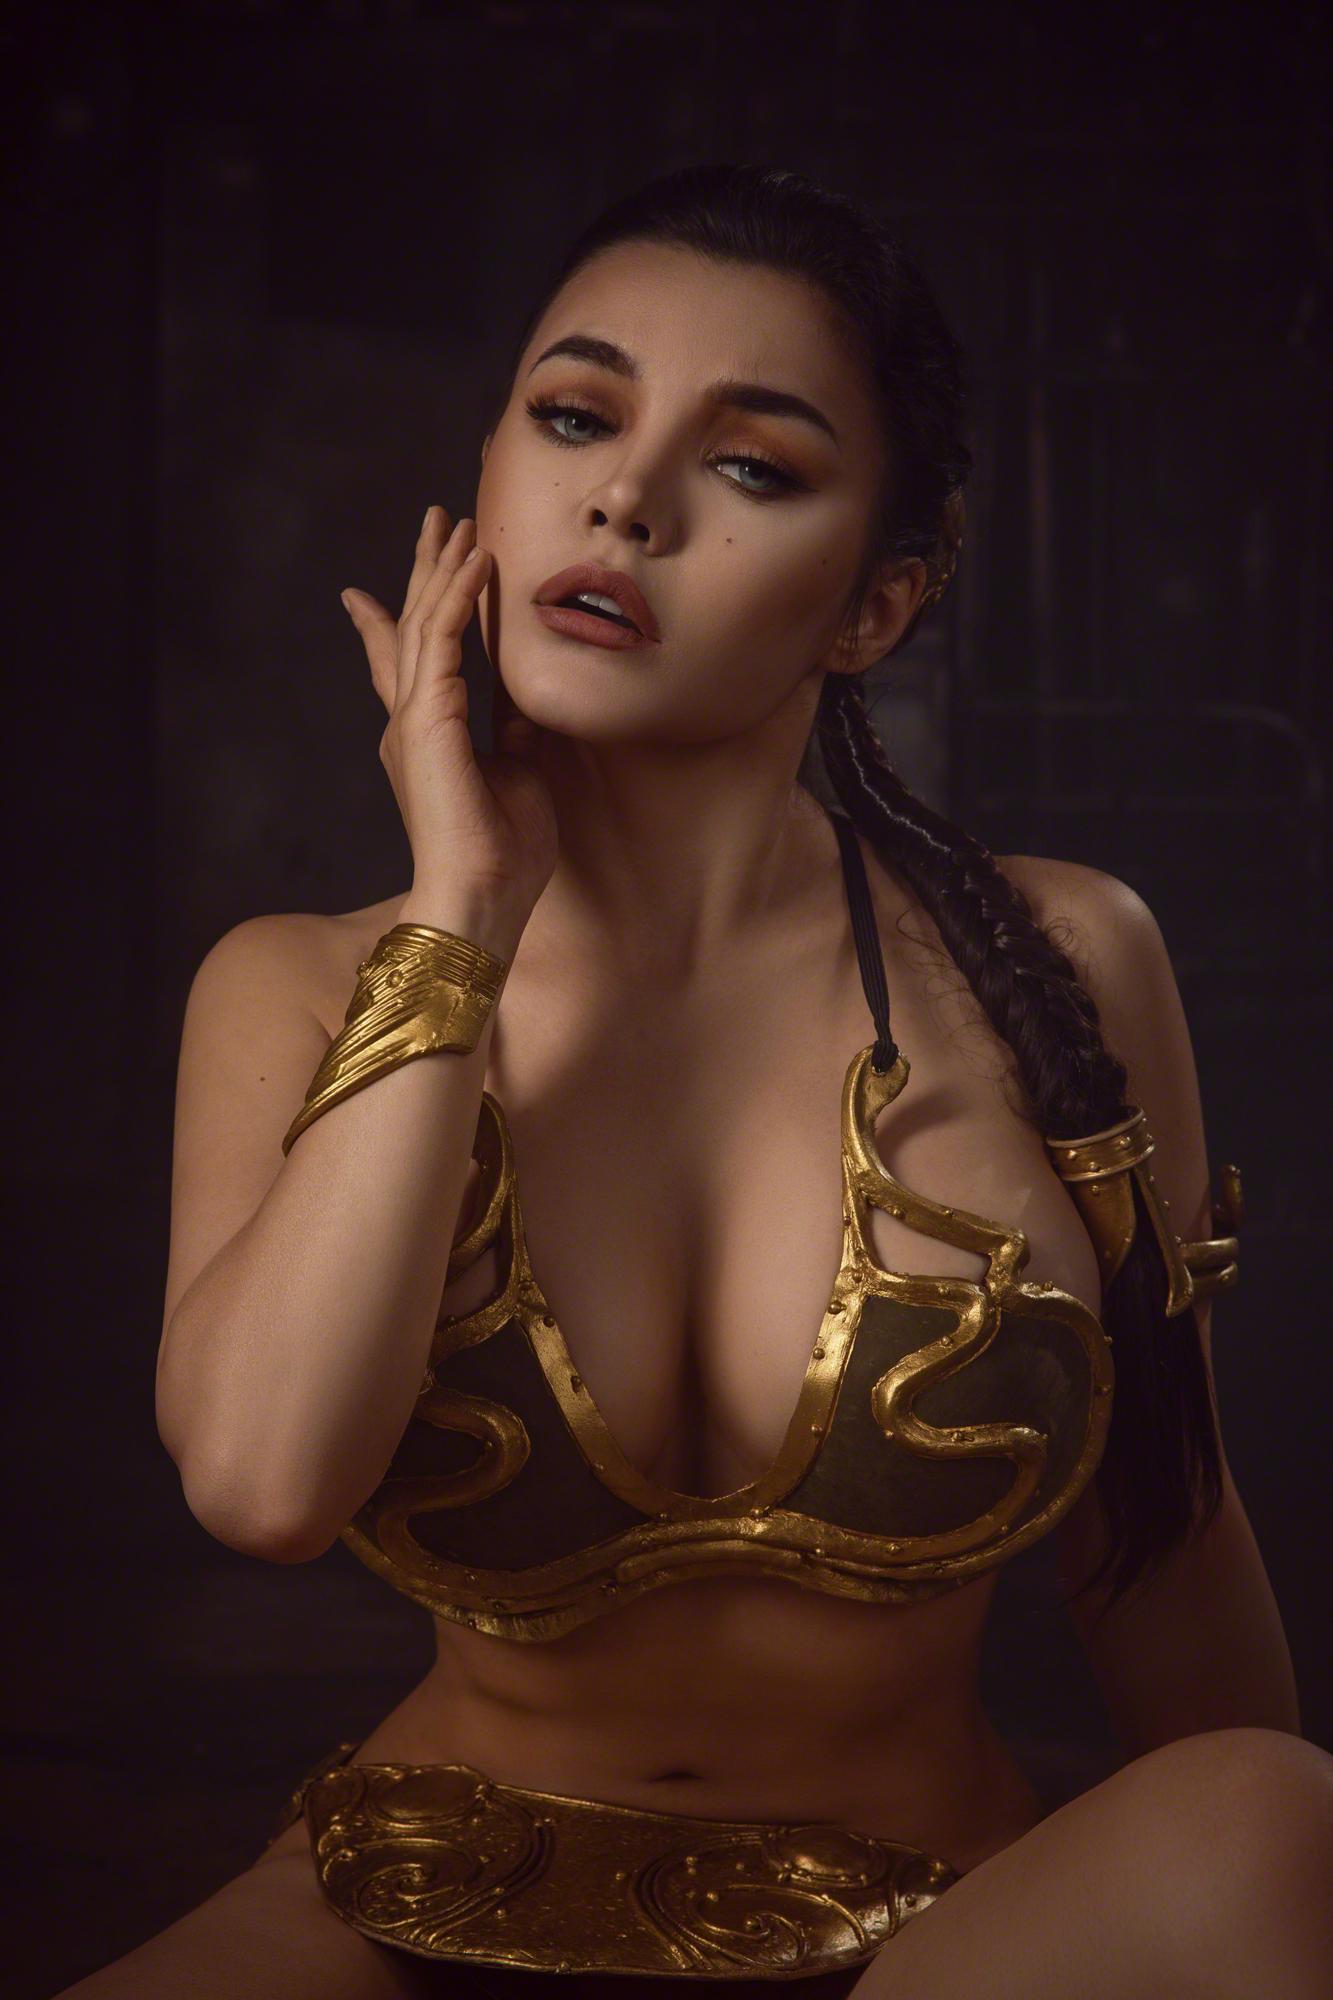 Kalinka Fox Princess Leia Slave Cosplay Set Leaked Trzrhe